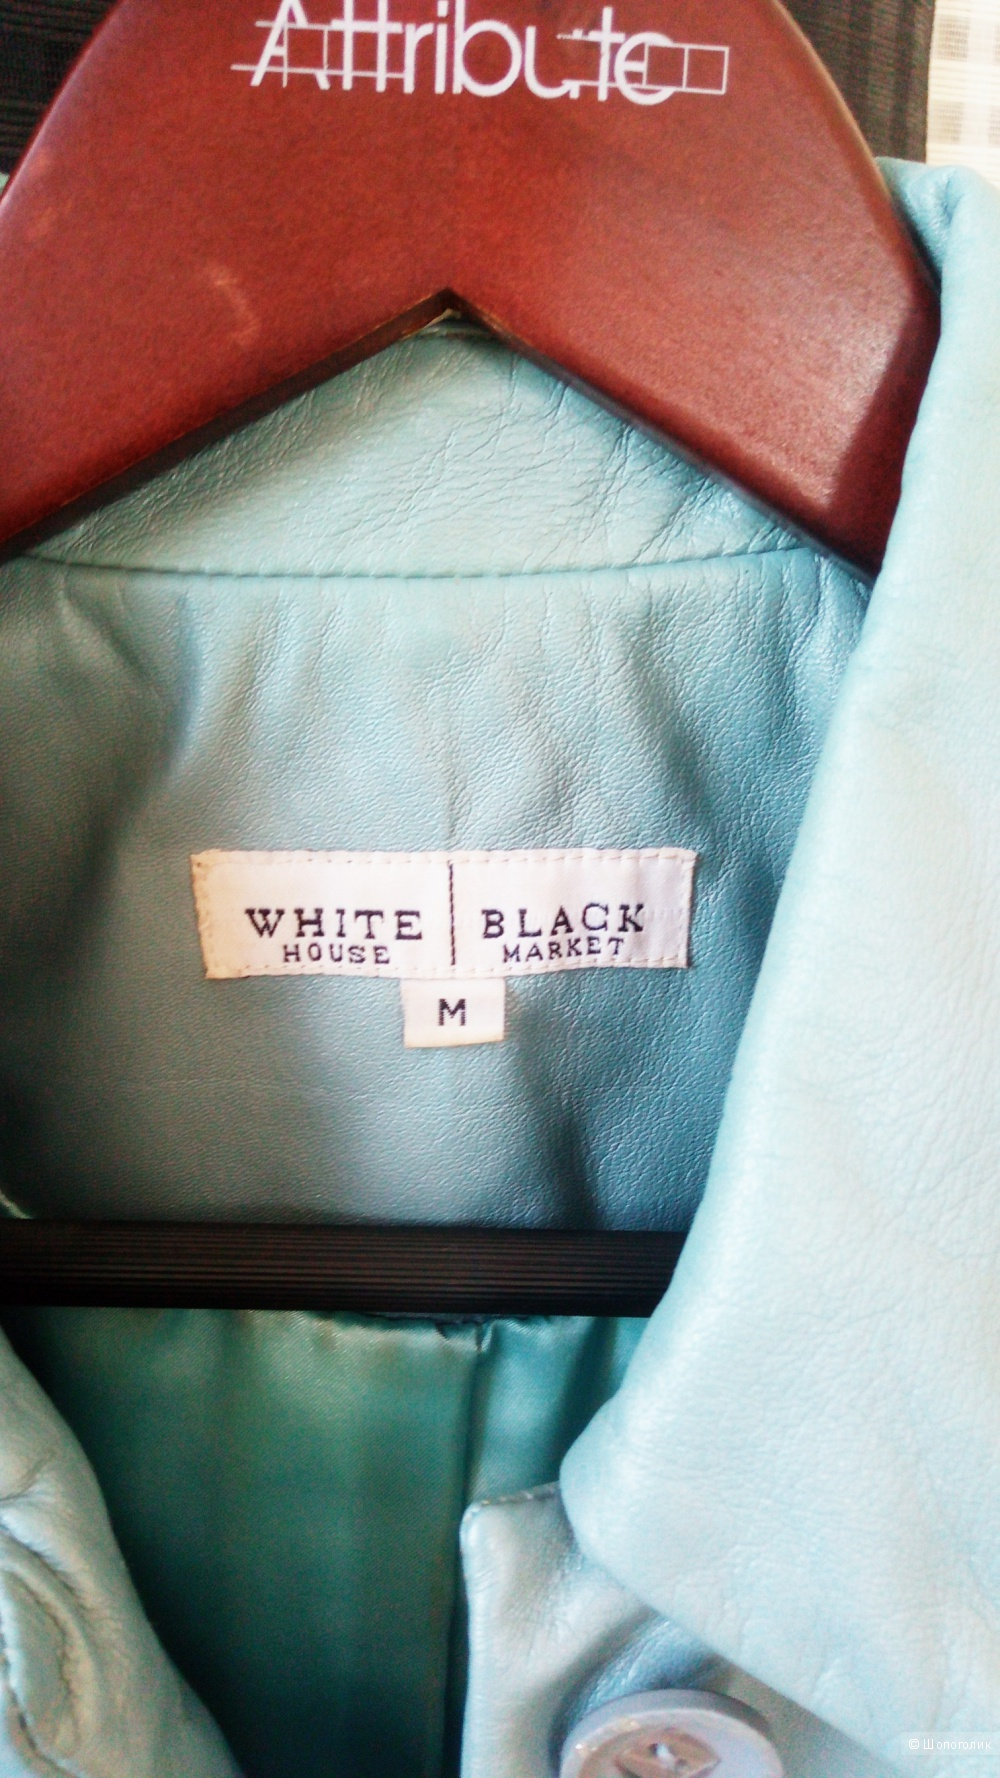 Кожаная куртка, Whote house Black market, М